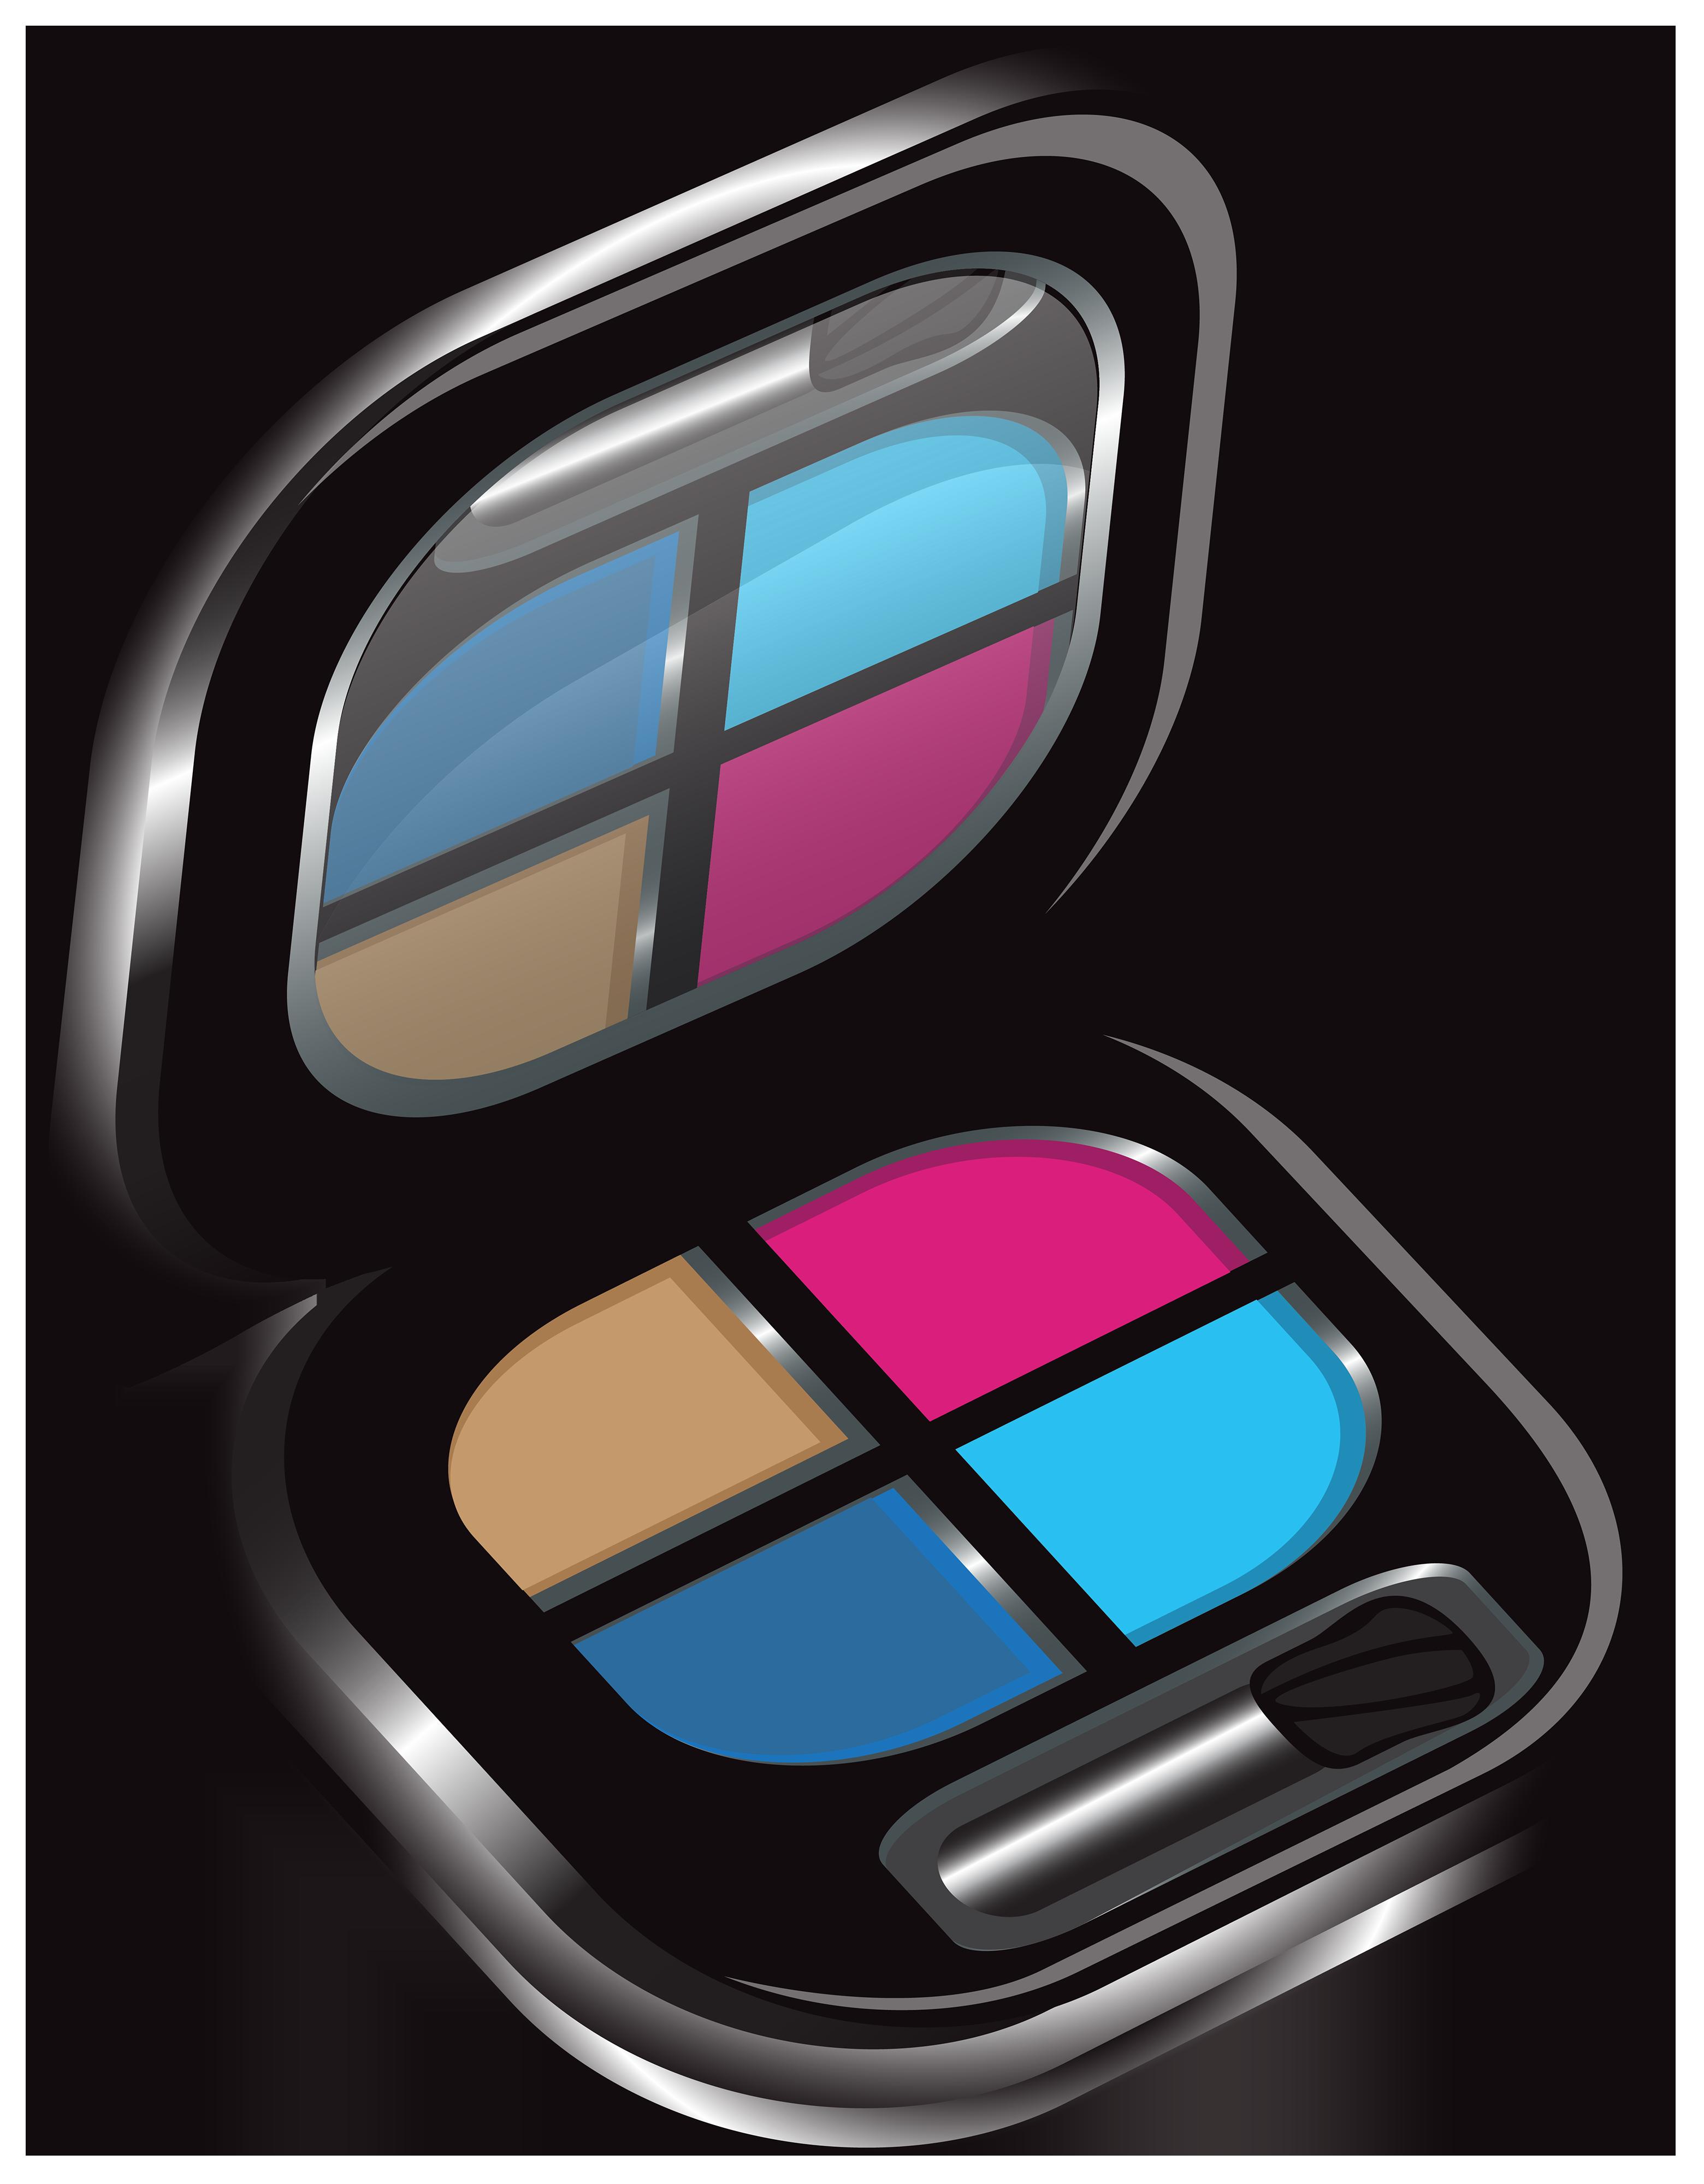 Lipstick clipart eye shadow. Cosmetics clip art eyeshadows